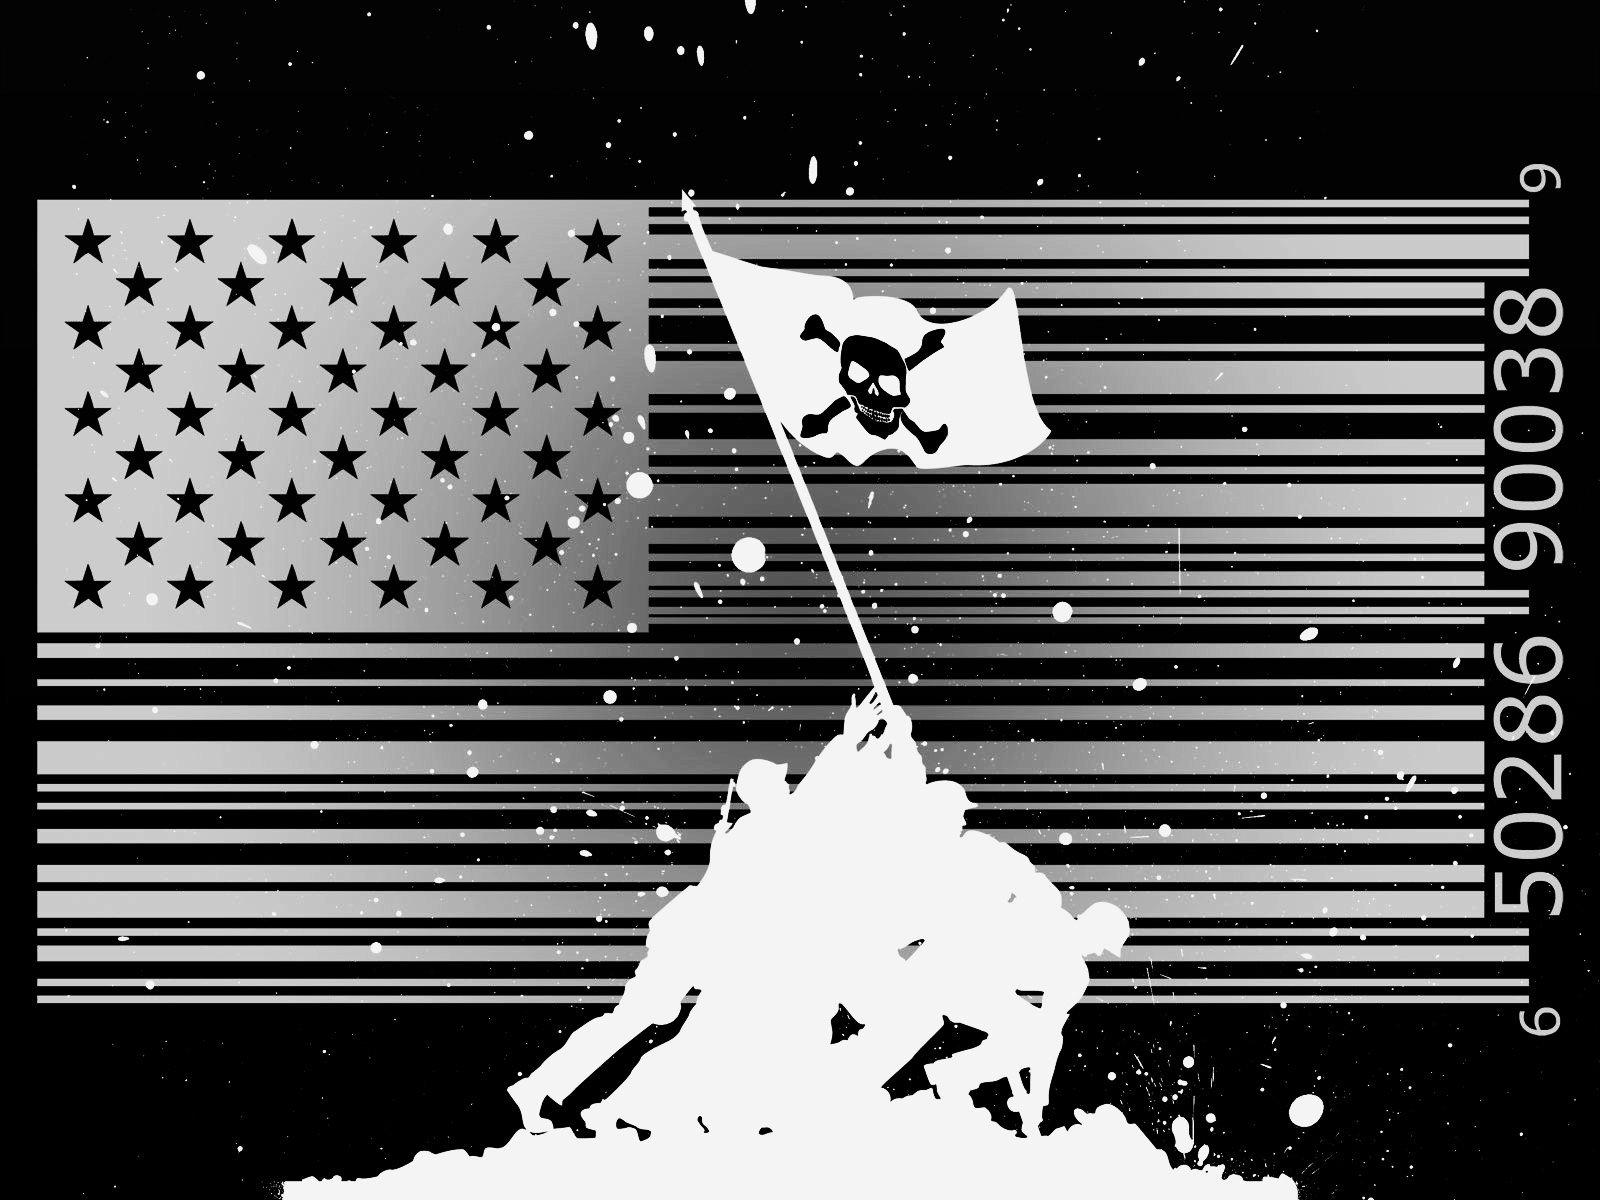 Dark Flags Usa Piracy Barcode Iwo Jima Jolly Roger Wallpaper